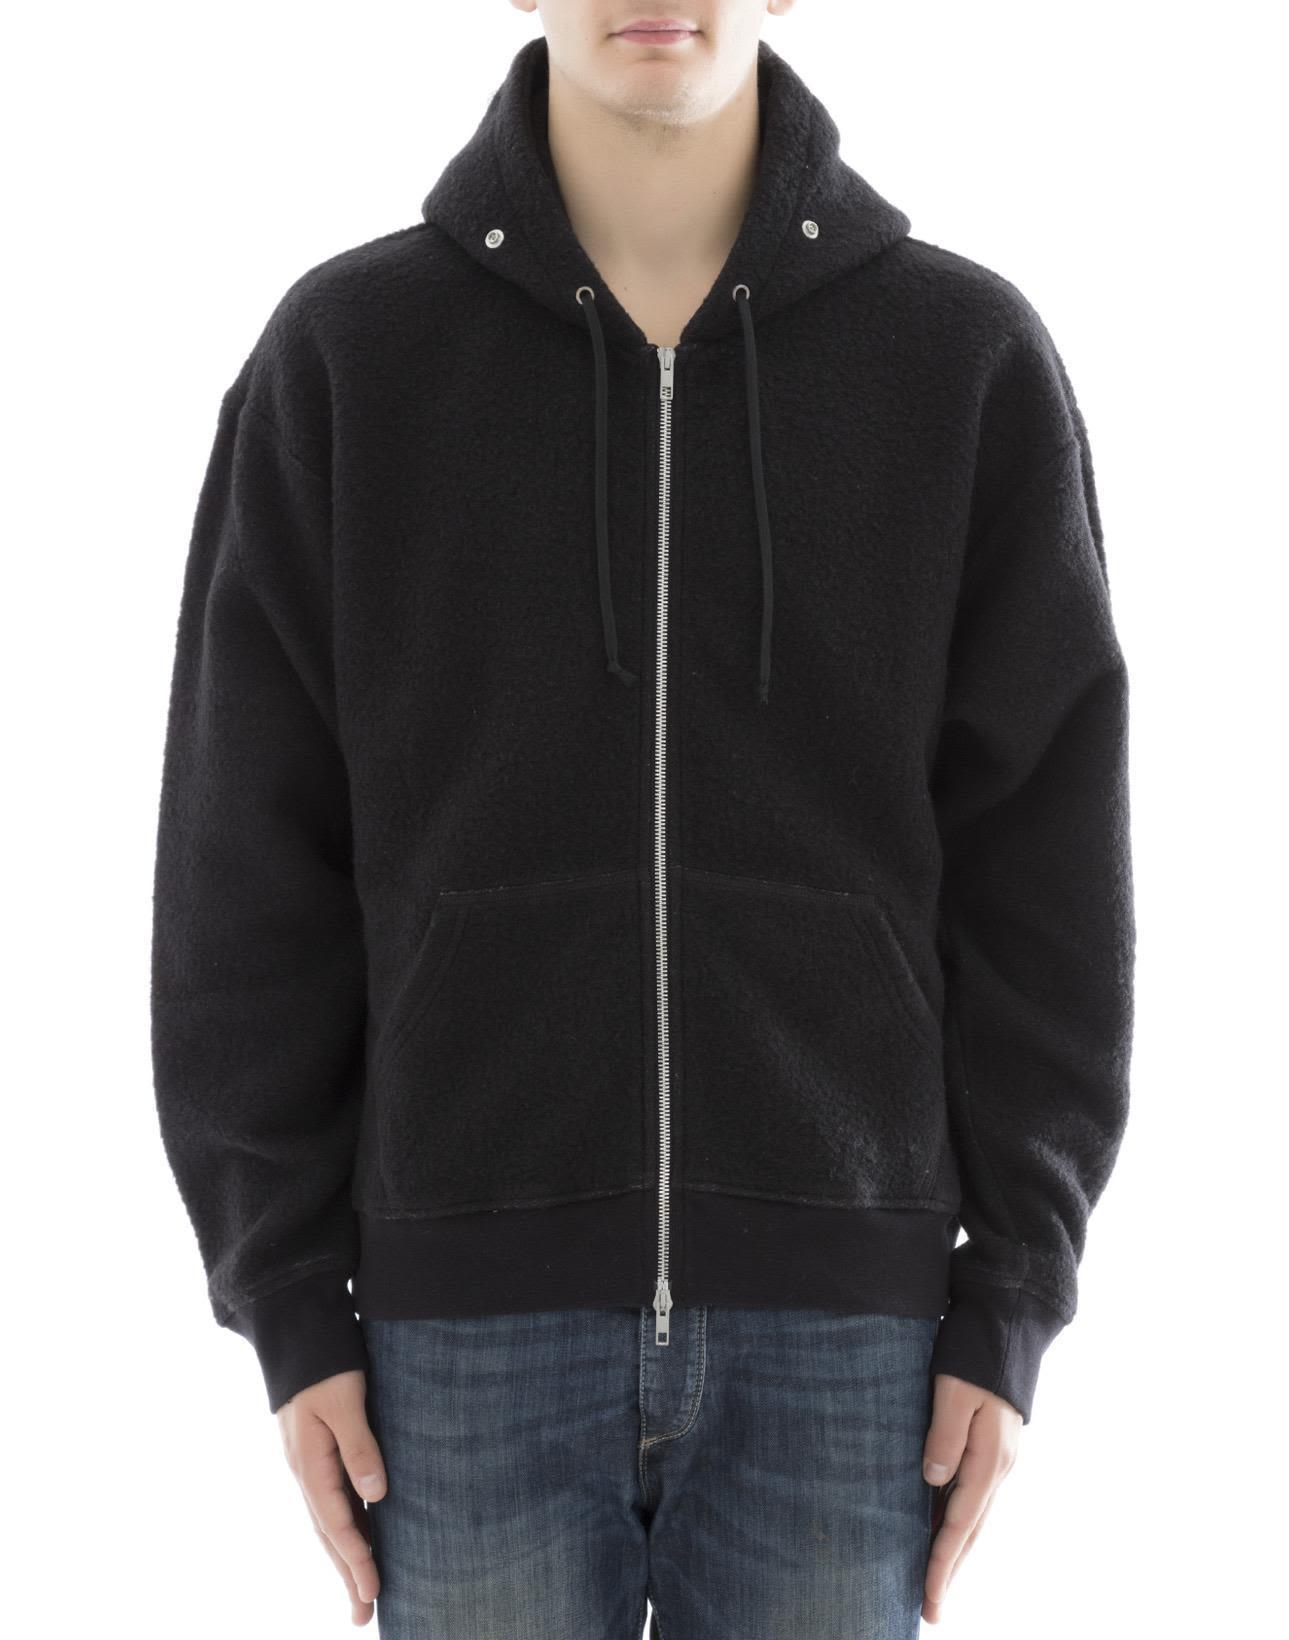 Maison Margiela Black Cotton Sweater